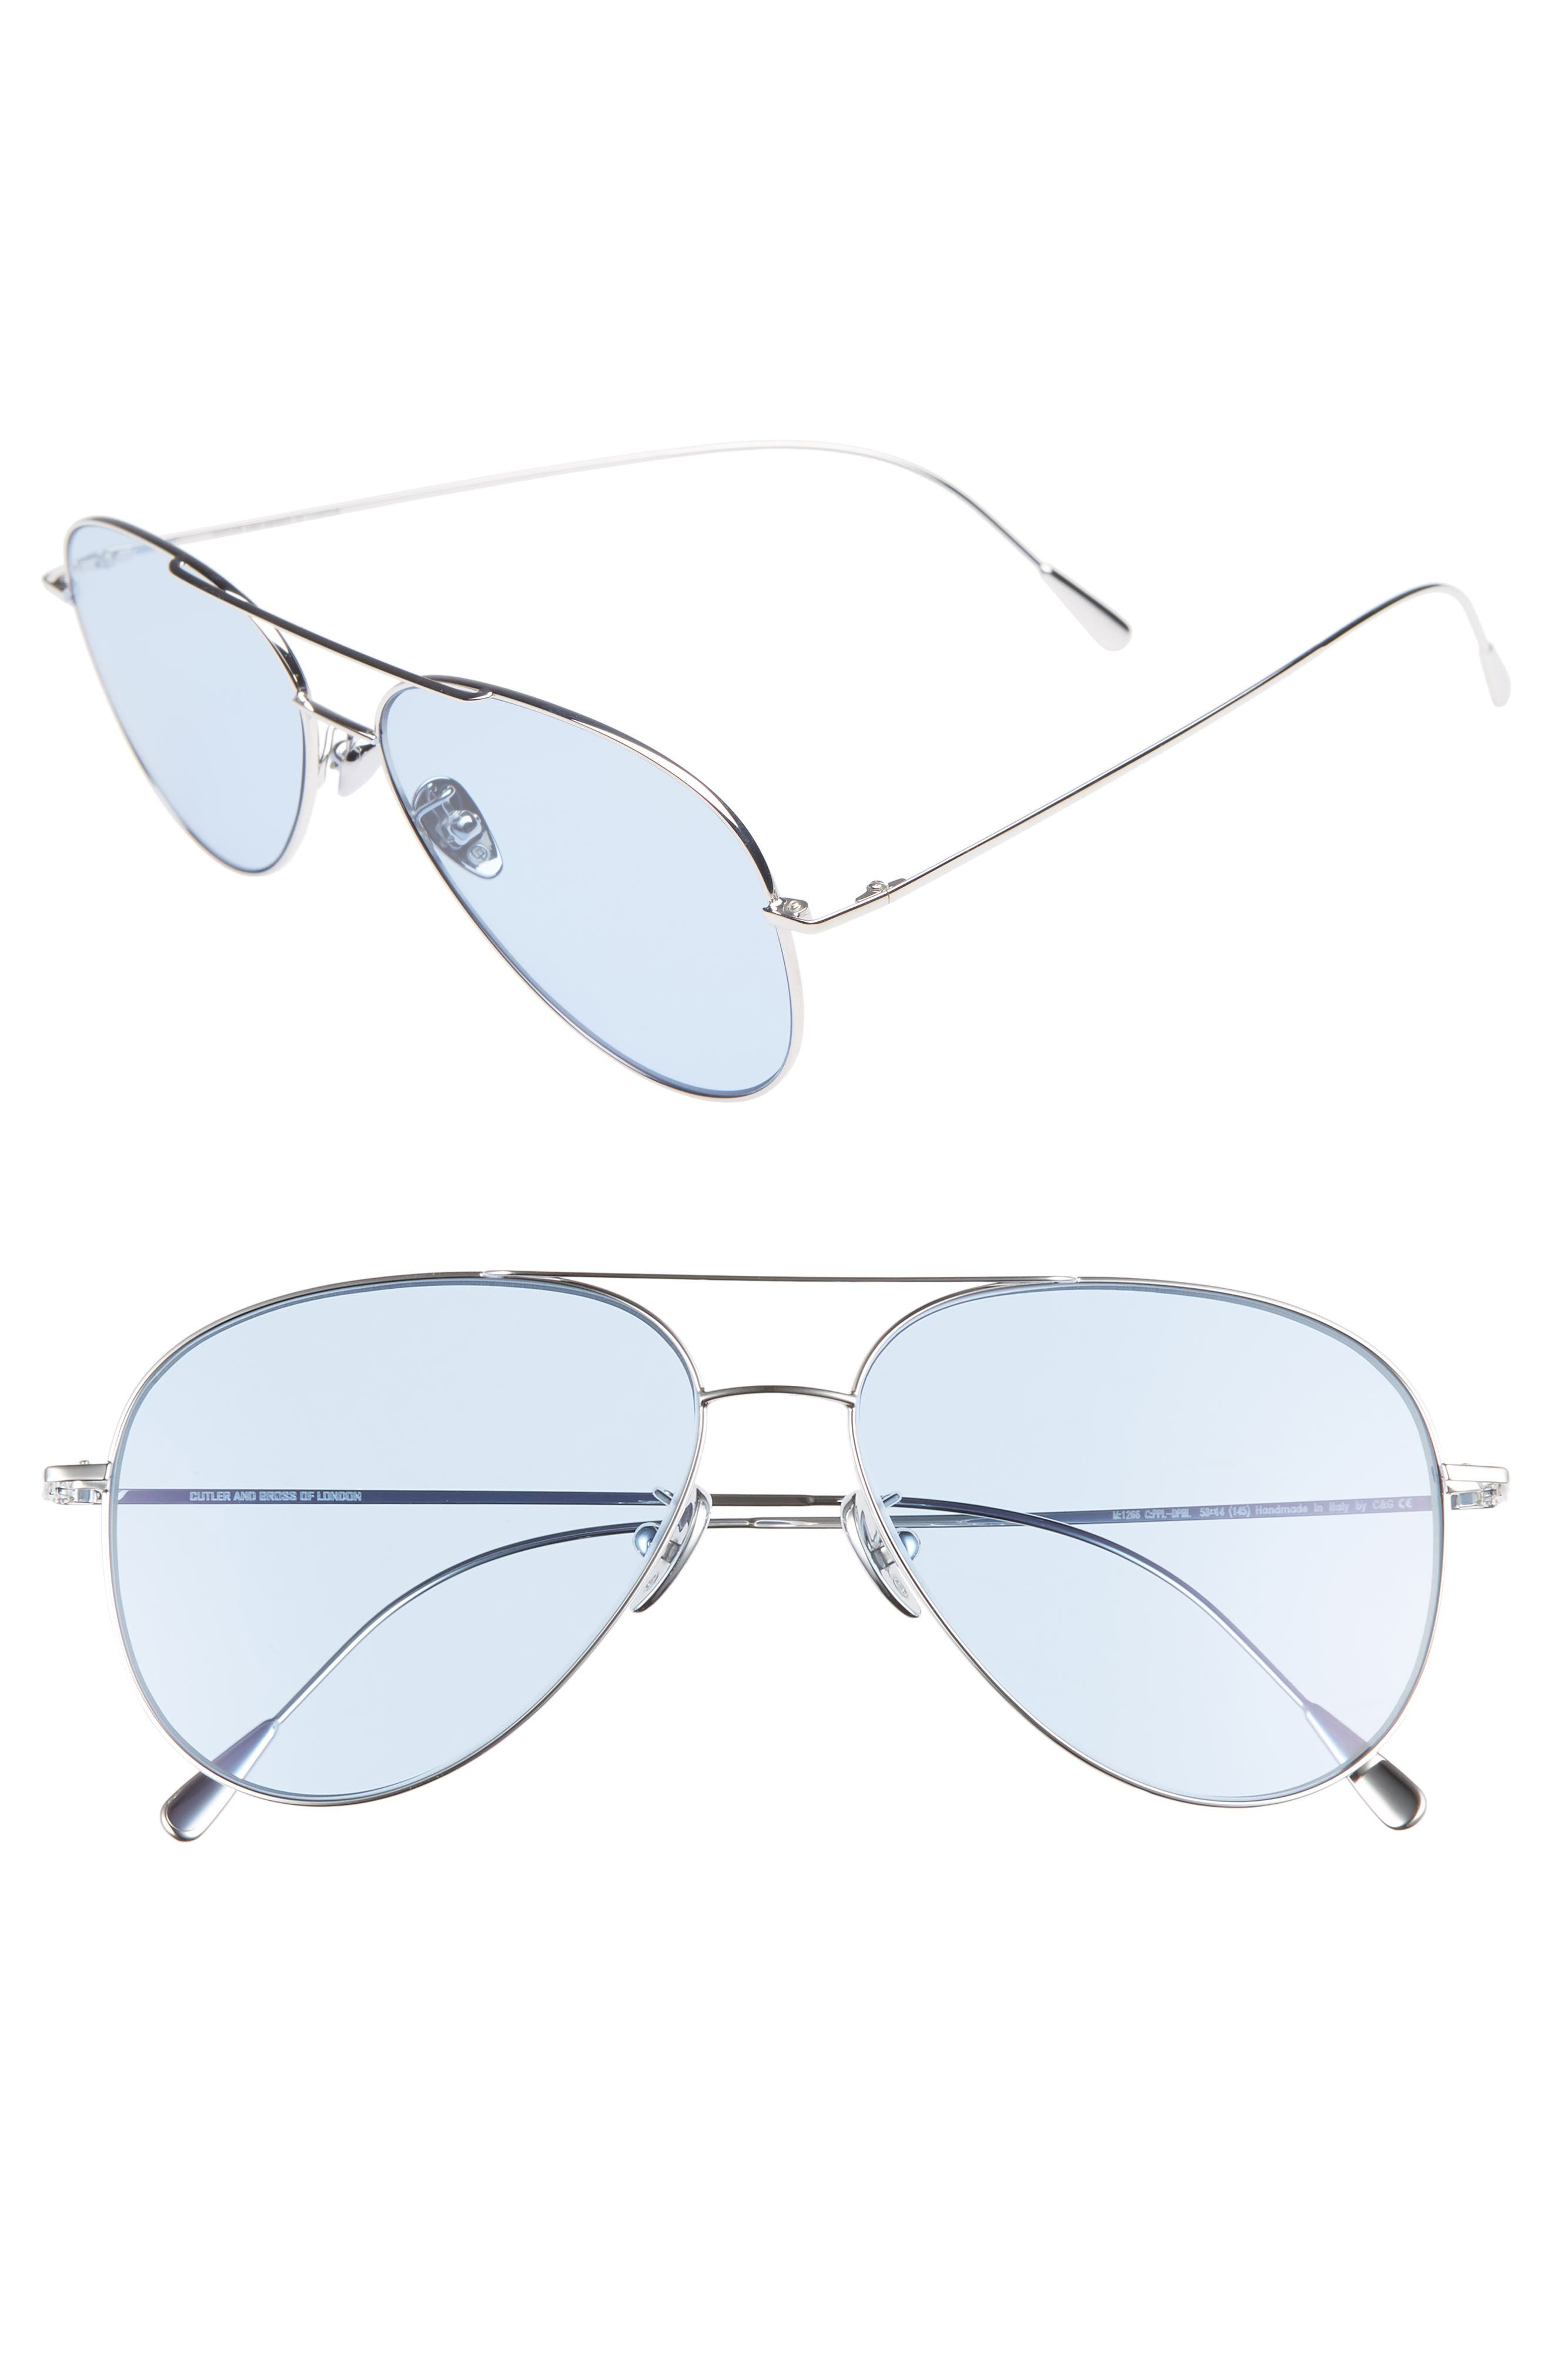 58mm Polarized Aviator Sunglasses,                             Main thumbnail 1, color,                             PALLADIUM/ BLUE